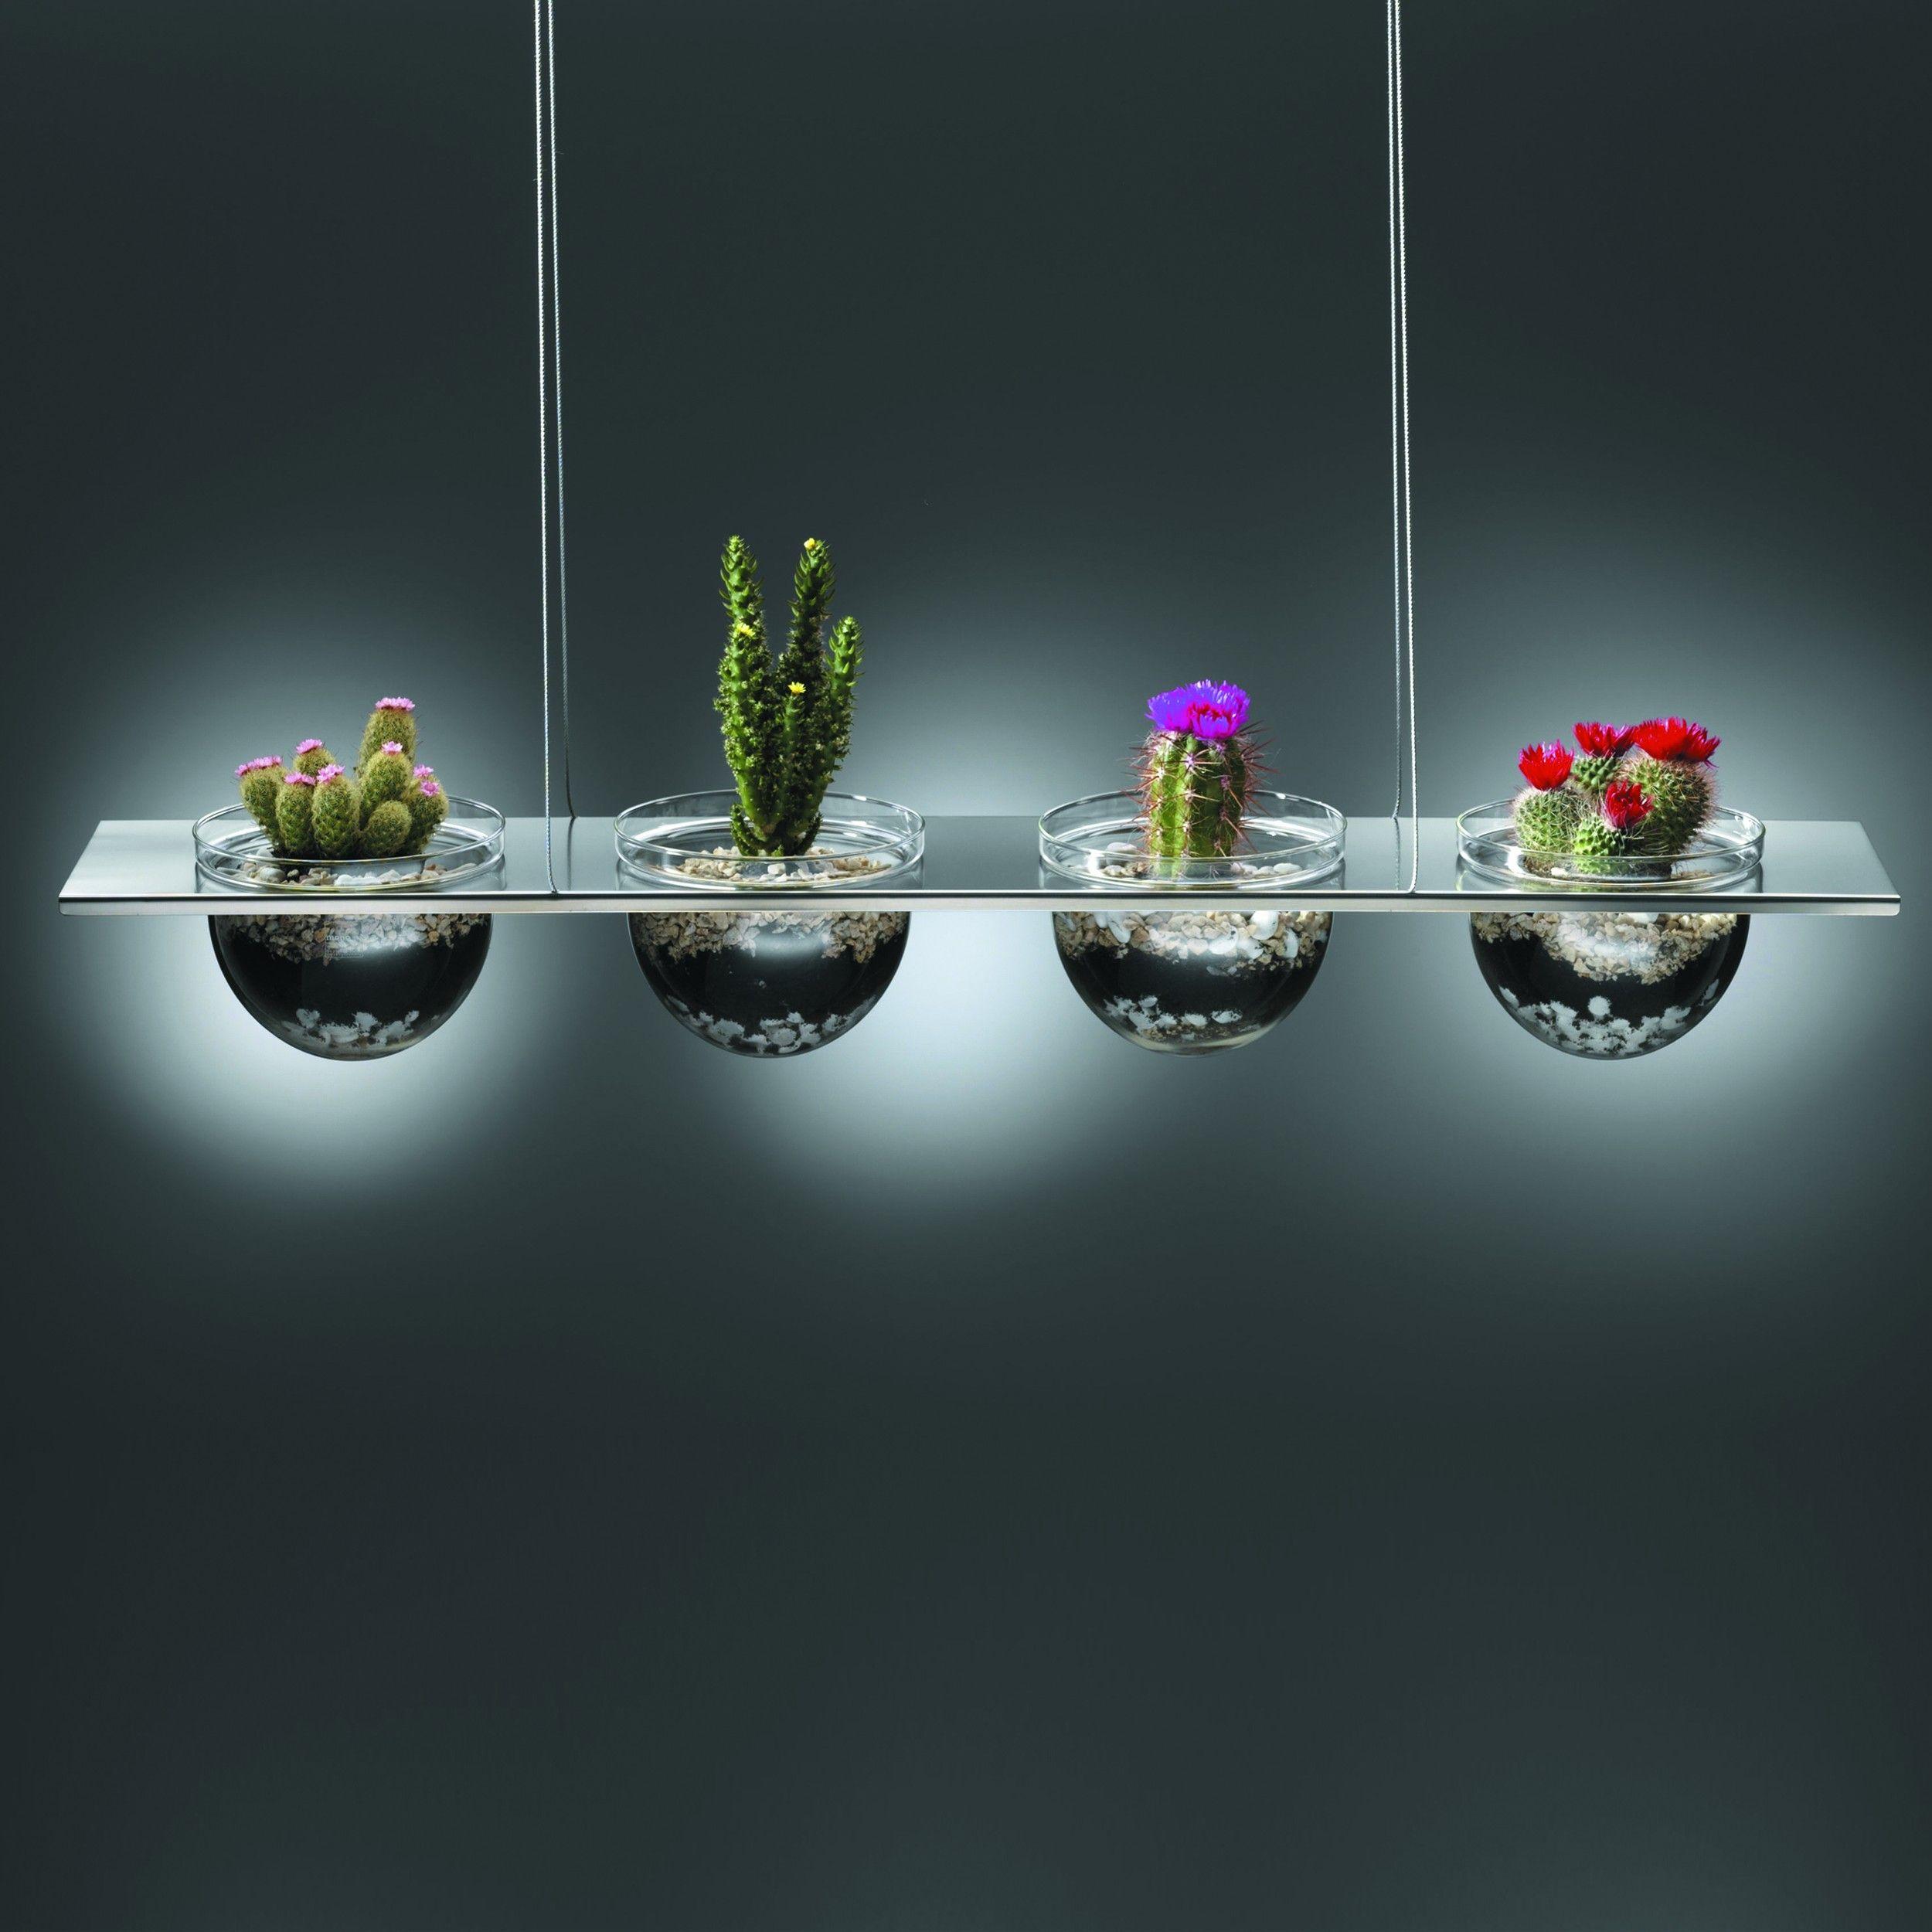 mono quartett h ngedeko 4 fach incl stahlseil shop. Black Bedroom Furniture Sets. Home Design Ideas